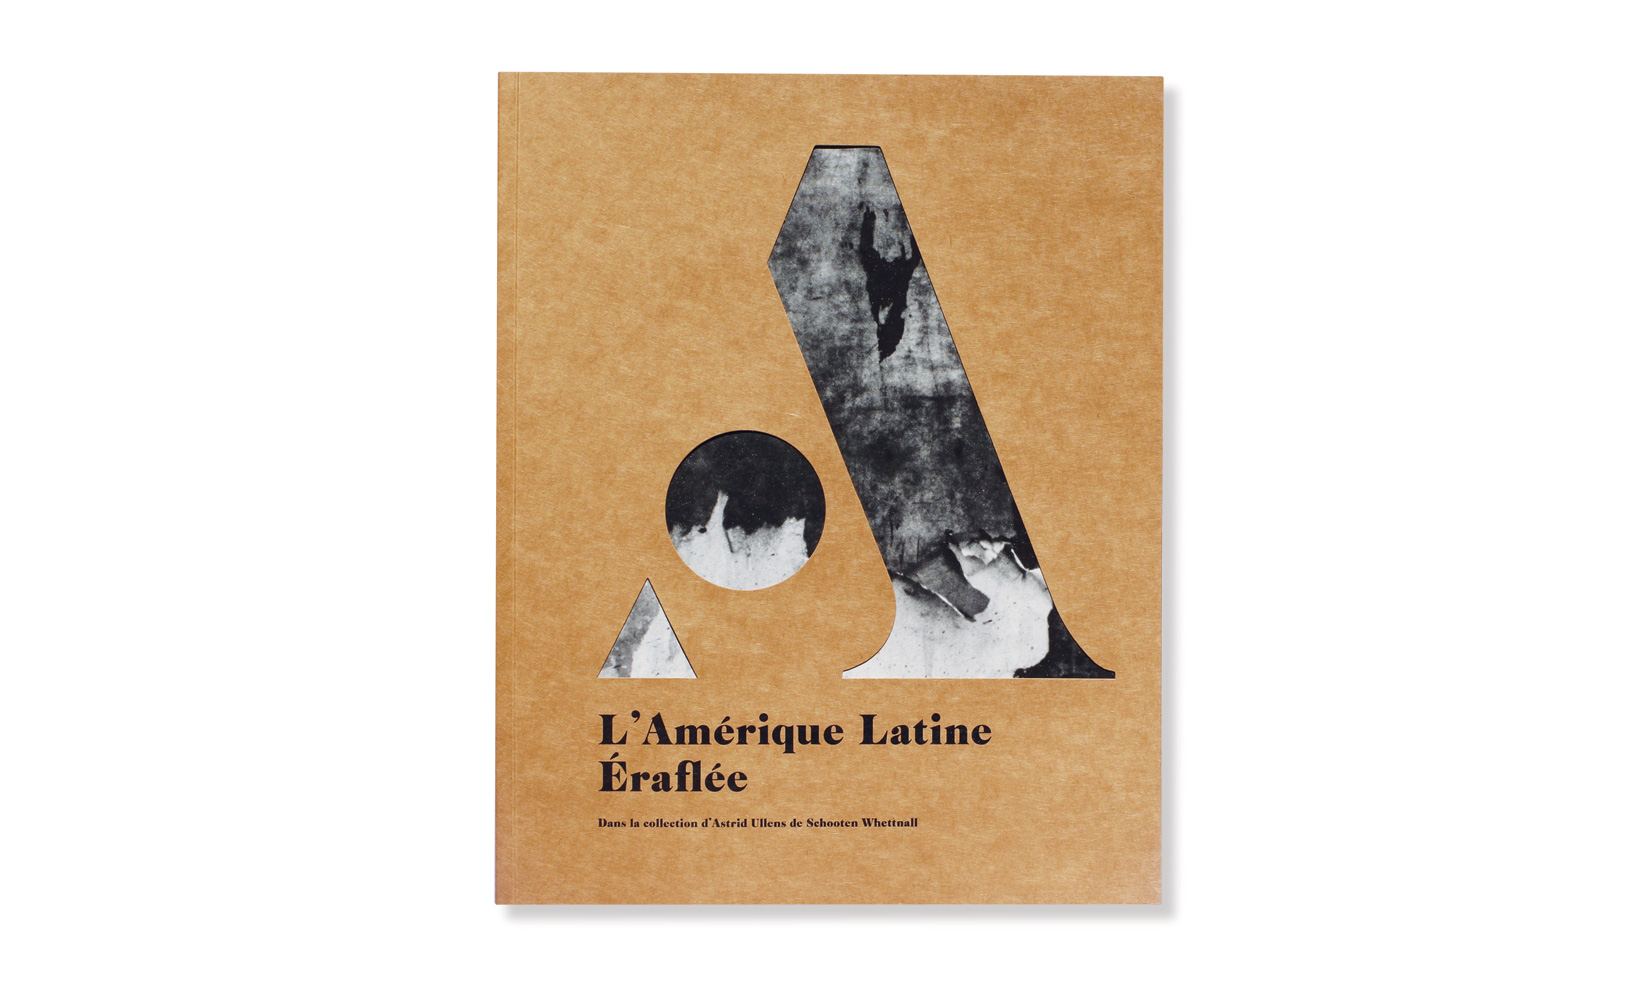 AMERIQUE-ERAFLEE-FONDATION-A-TOLUCA-STUDIO-OLIVIER-ANDREOTTI-02.jpg